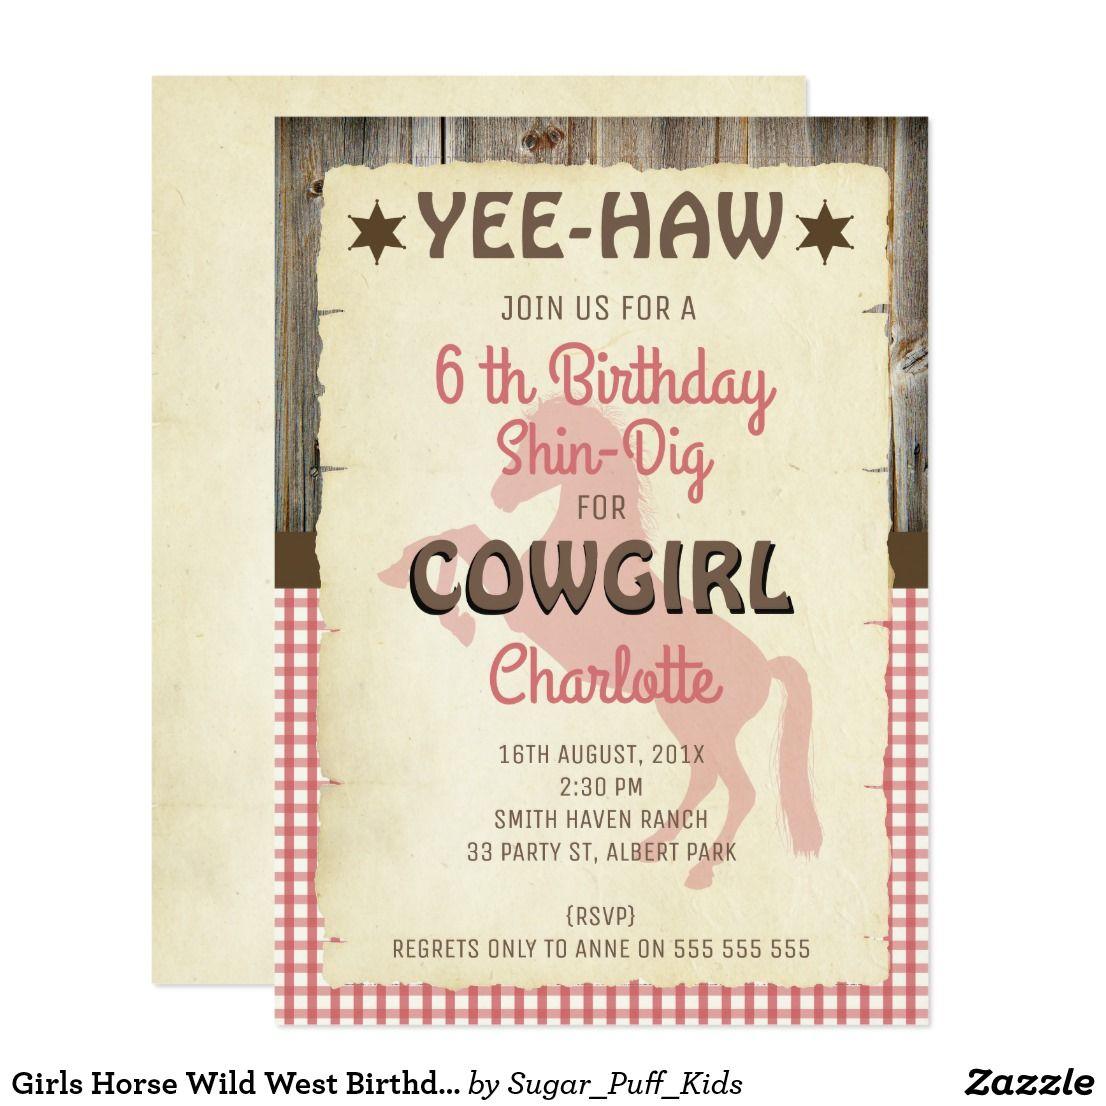 Girls Horse Wild West Birthday Party Invitation This girl\'s Wild ...